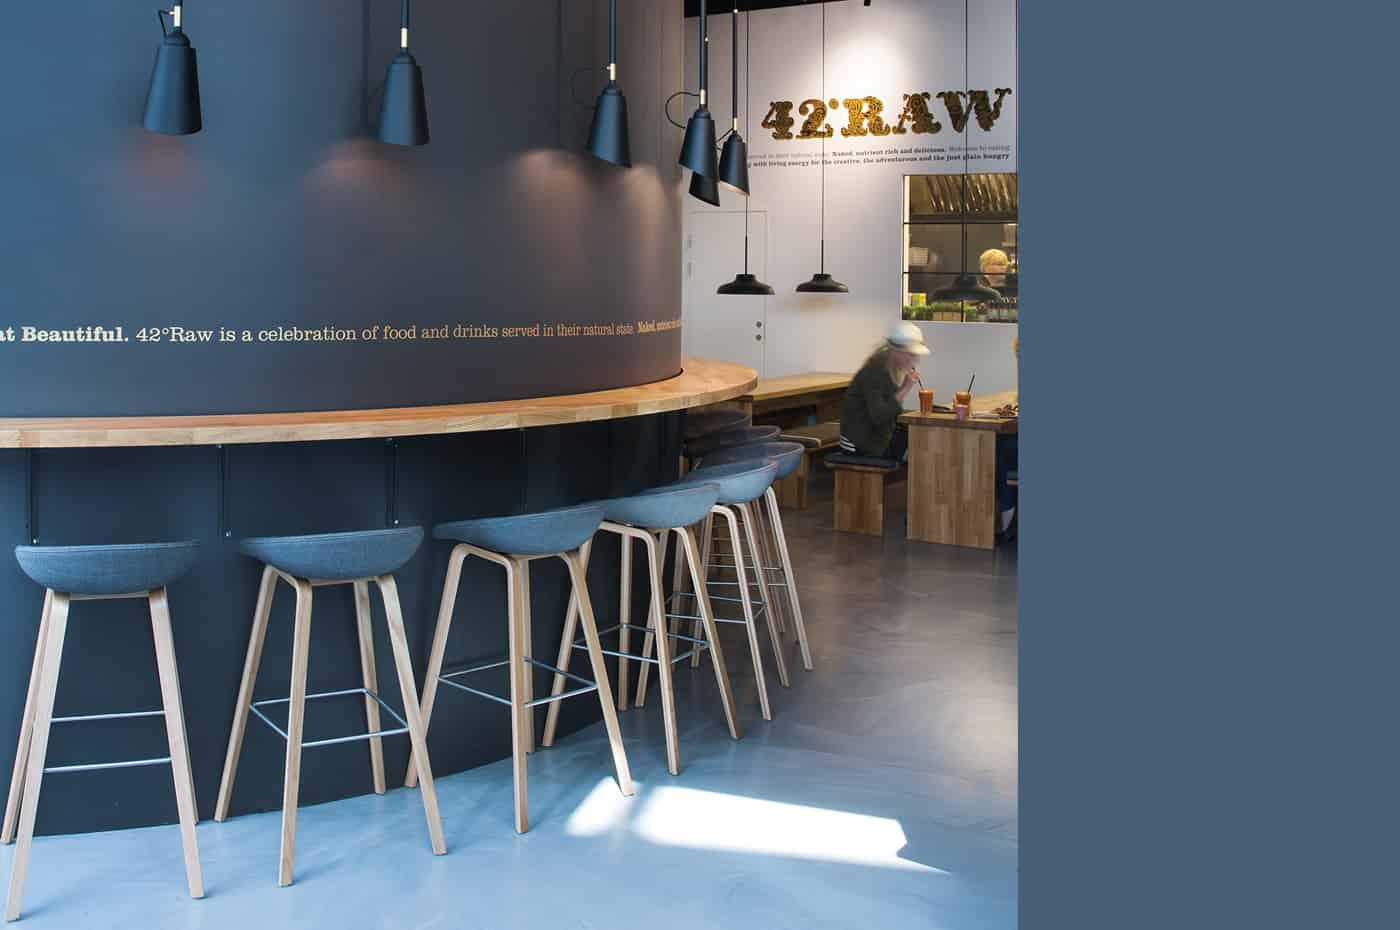 RITAarch, 42RAW, 42RAW Hellerup, indretning, spaceplanning, Cafeindretning, resturantindretning, cafe, siddeområde, dropin